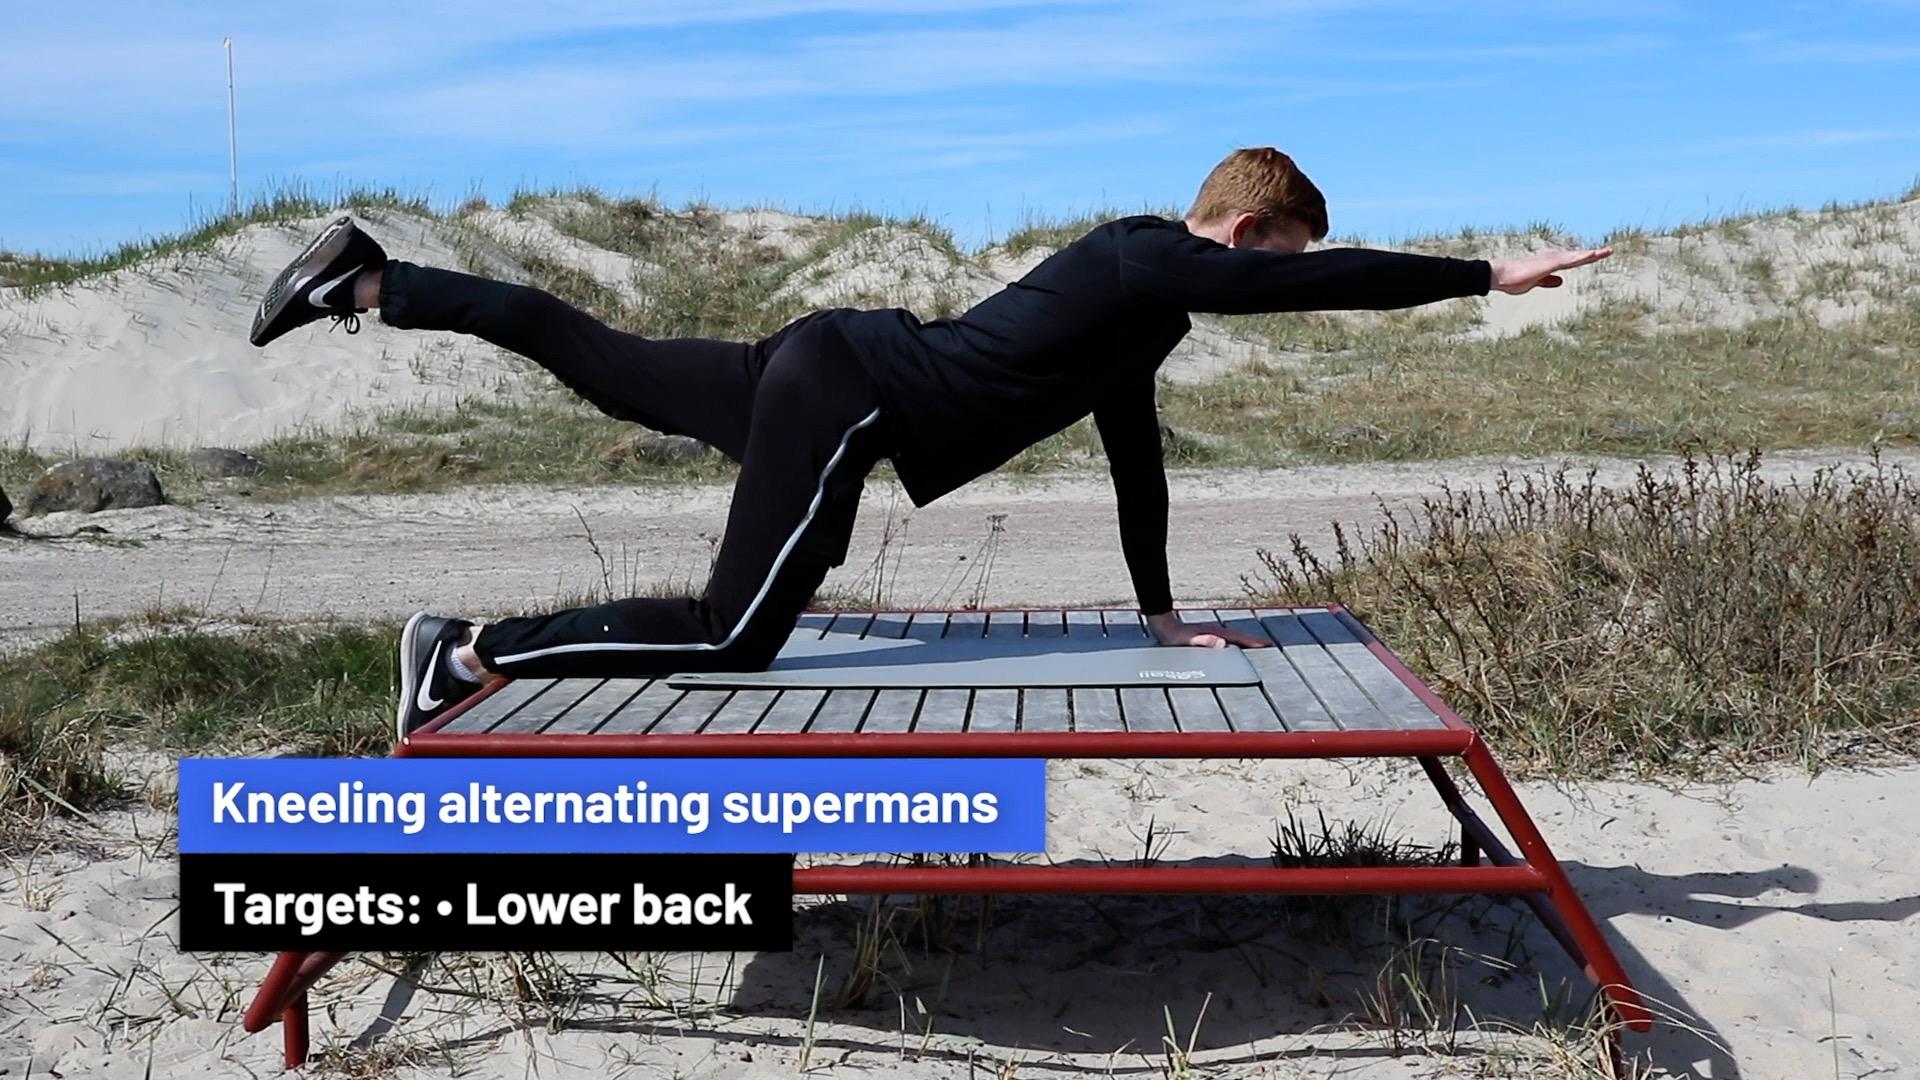 Kneeling alternating supermans